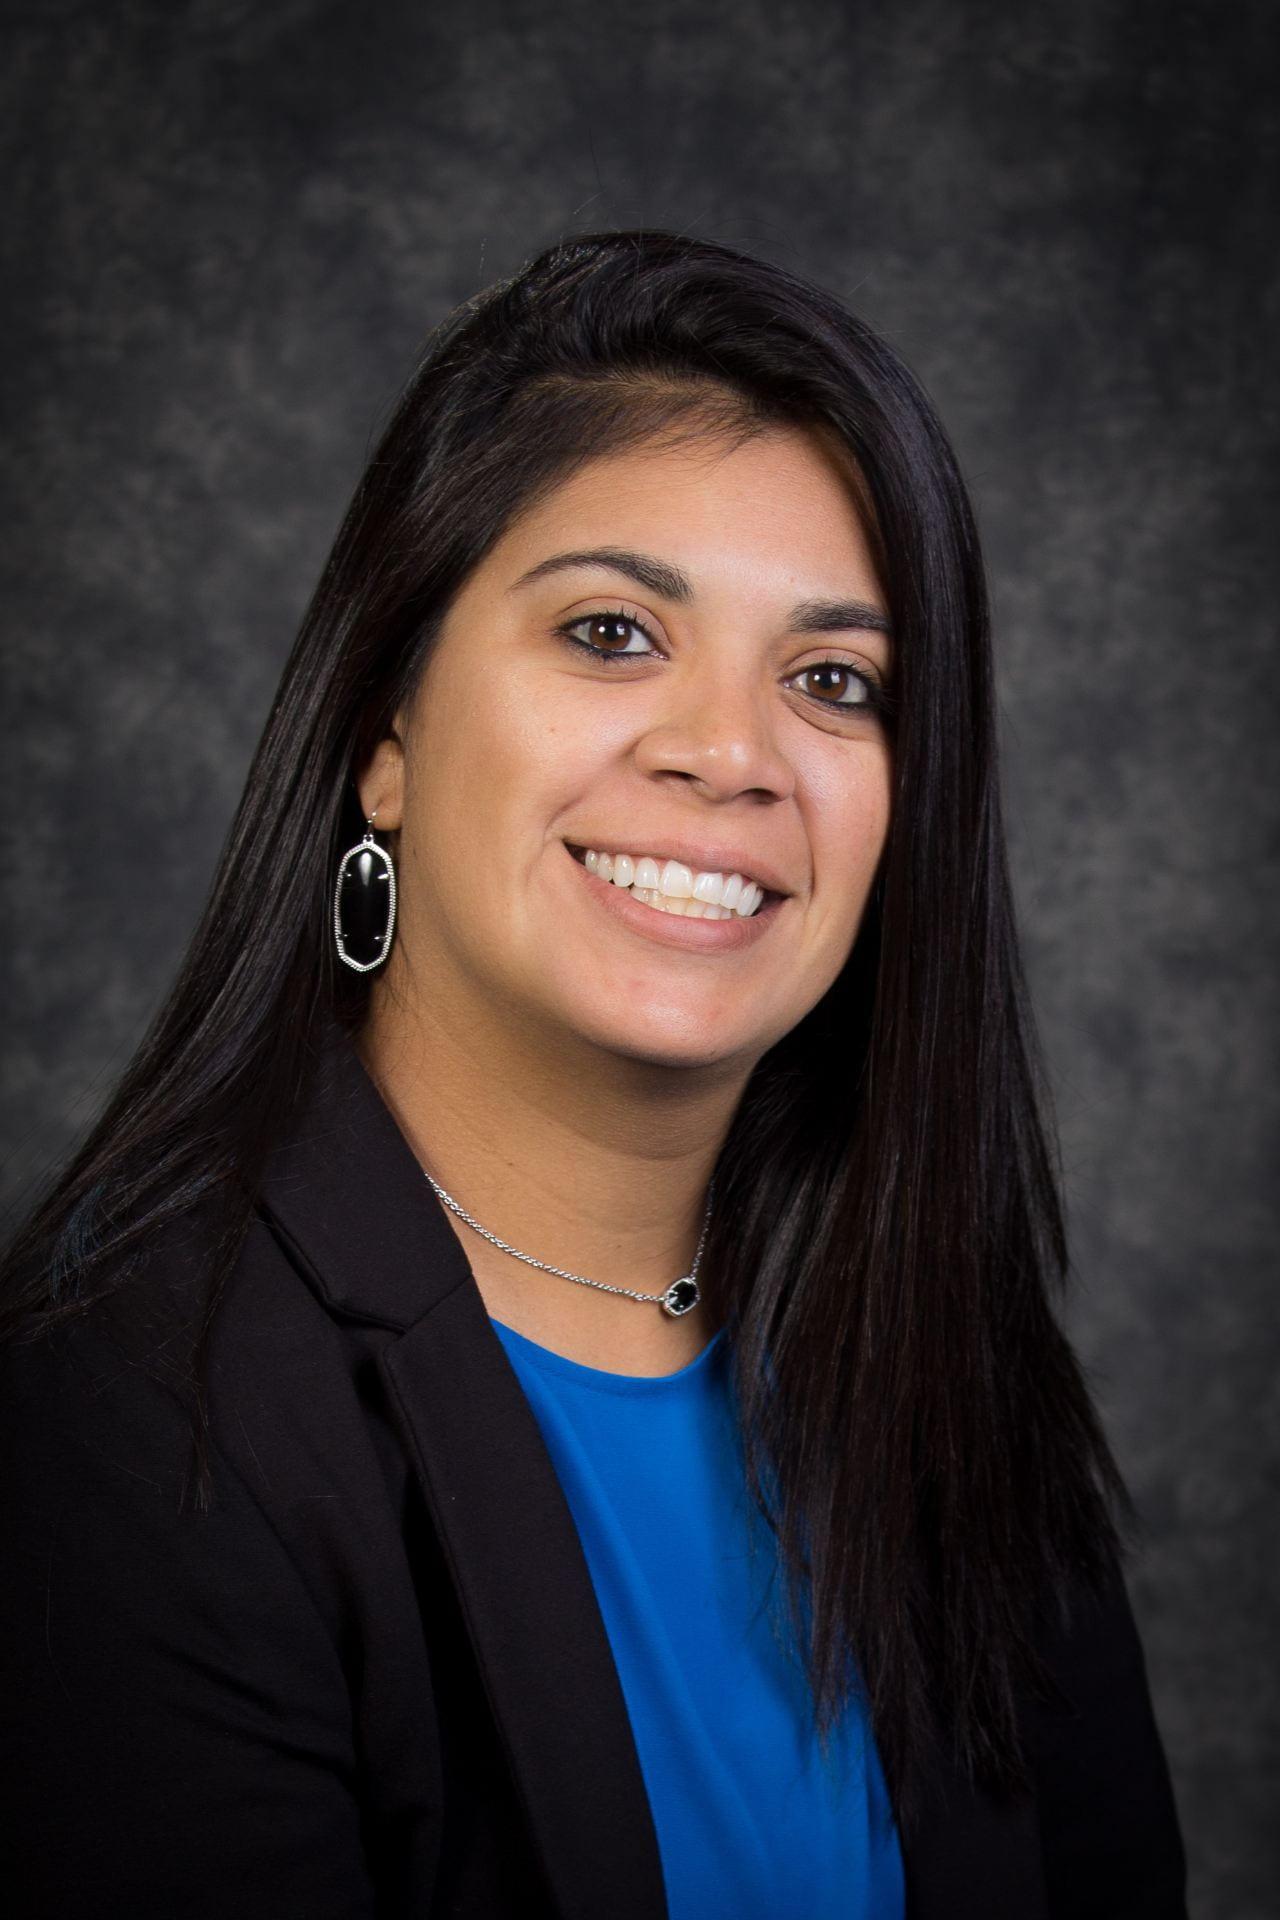 Dr. Betsy J. Mijares